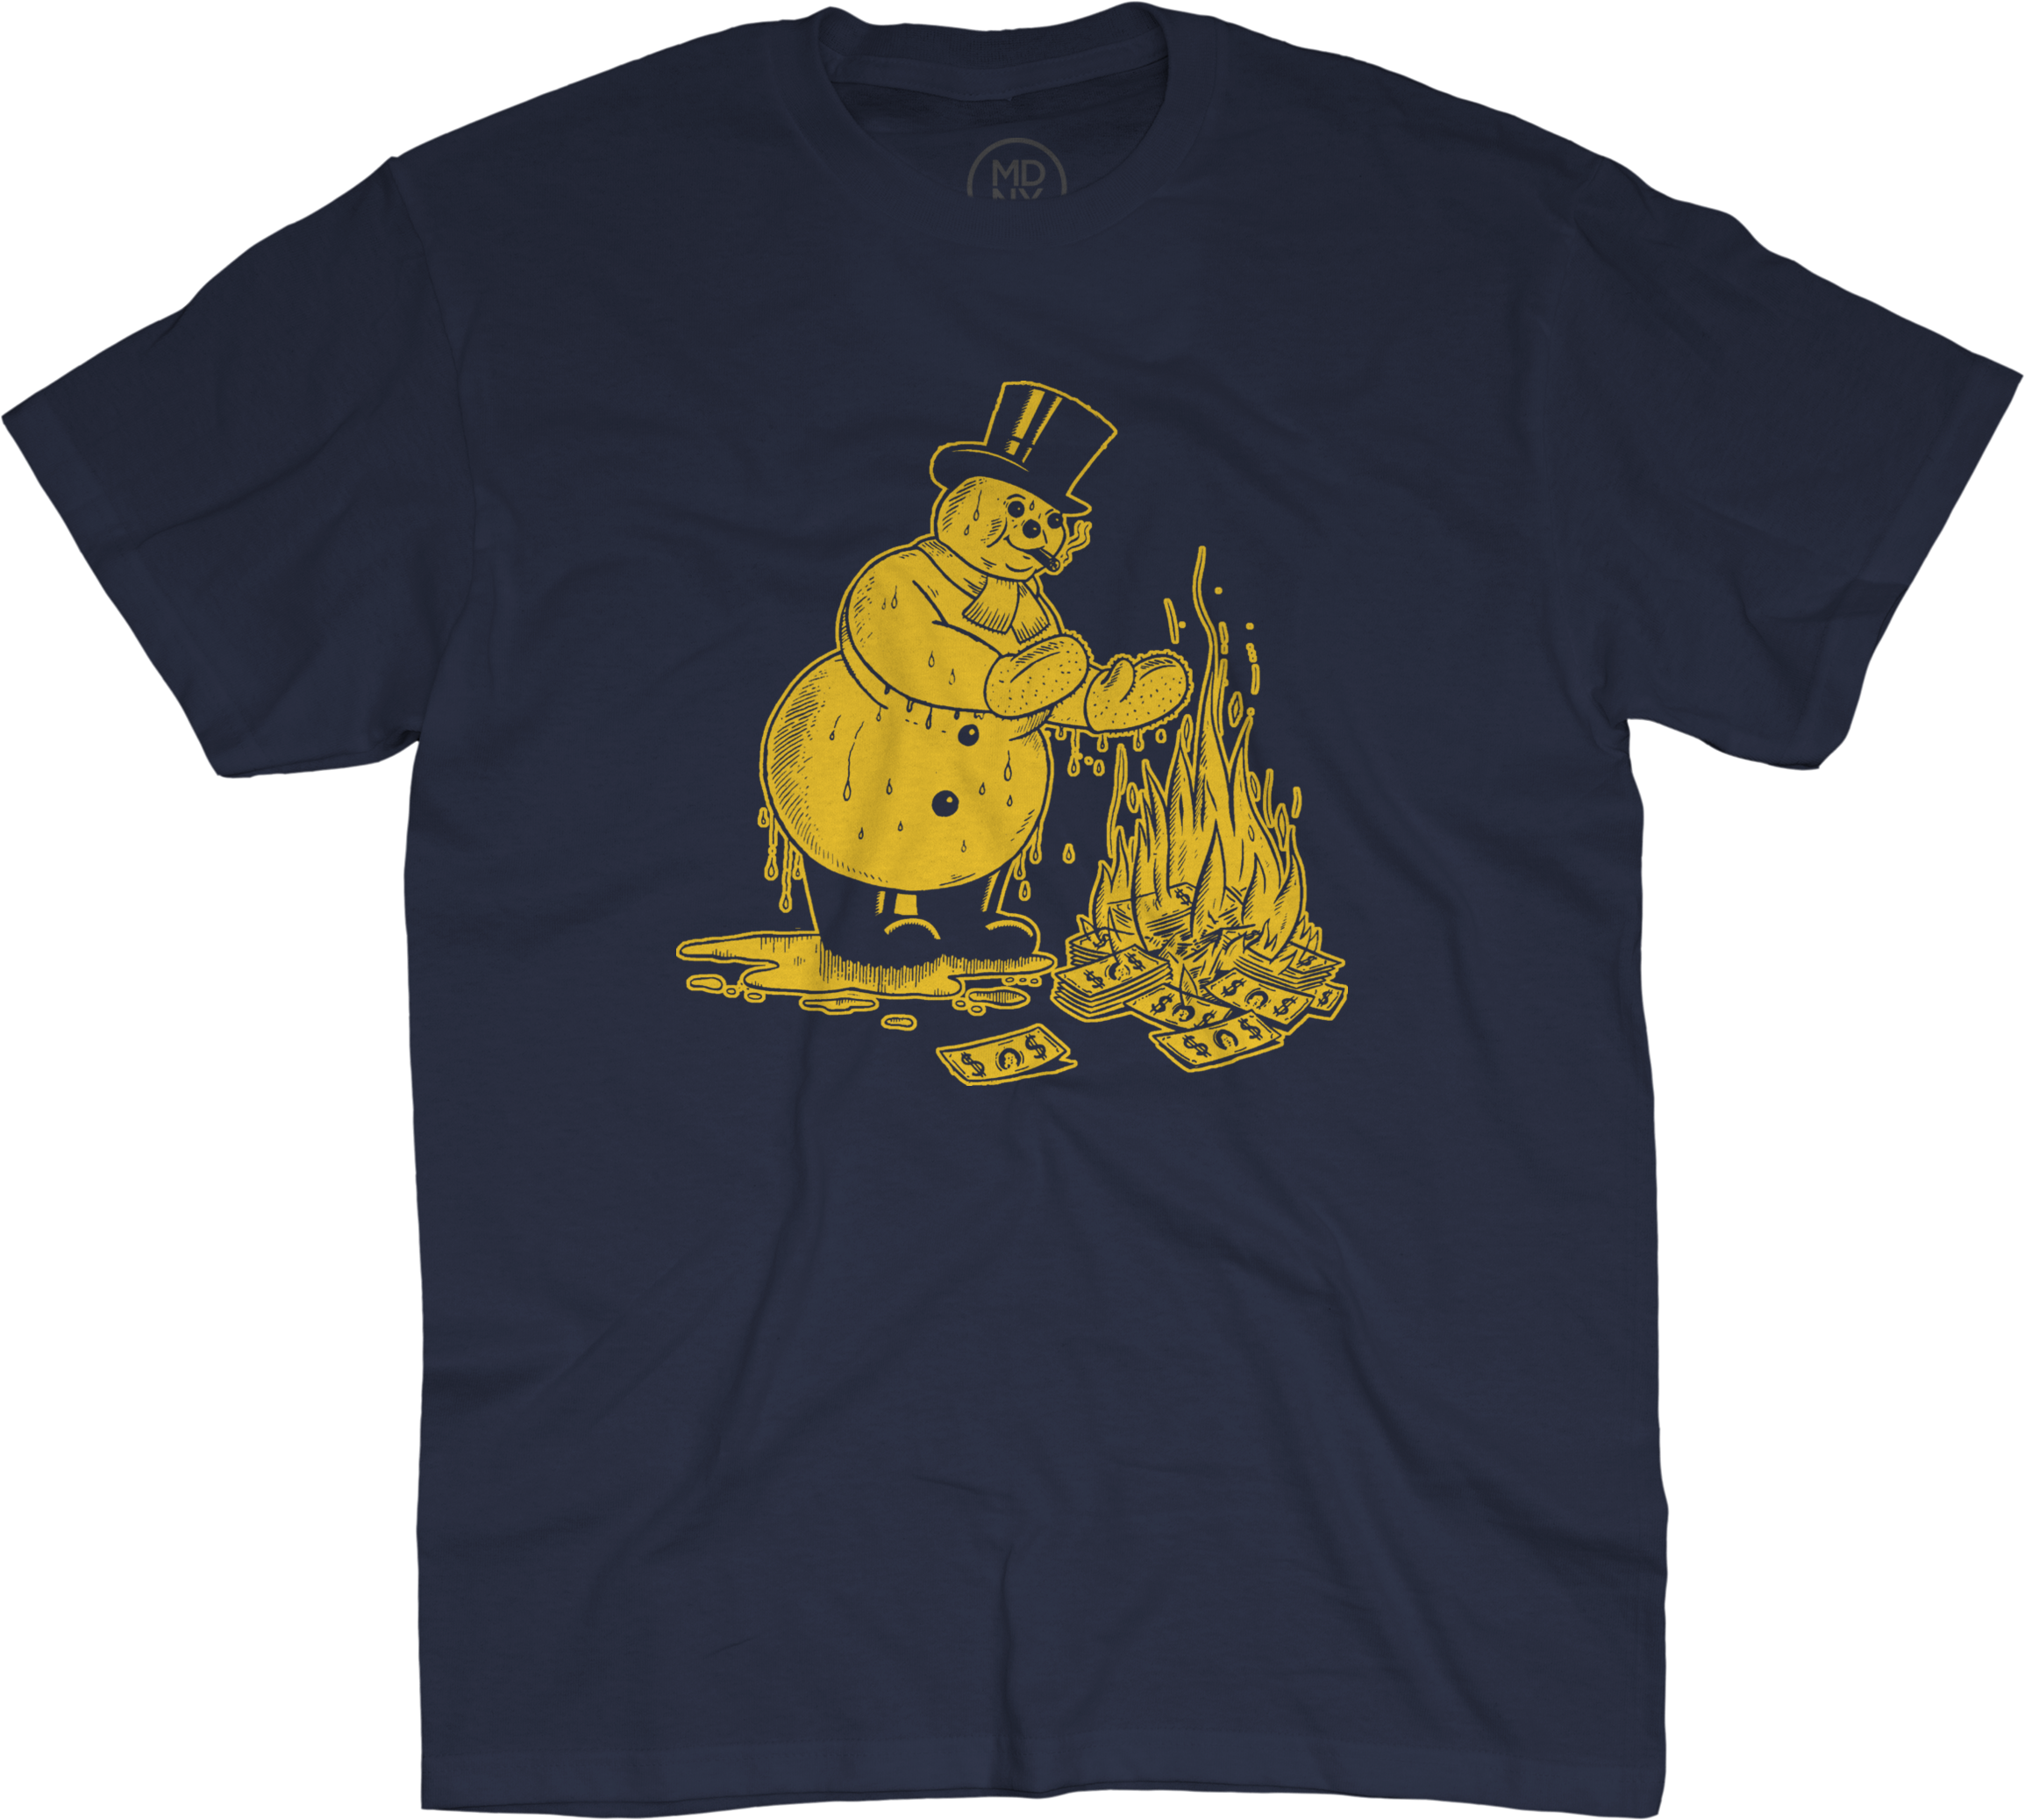 brand new 014b2 cbb9b They Might Be Giants - Snowman on Navy Blue T-Shirt